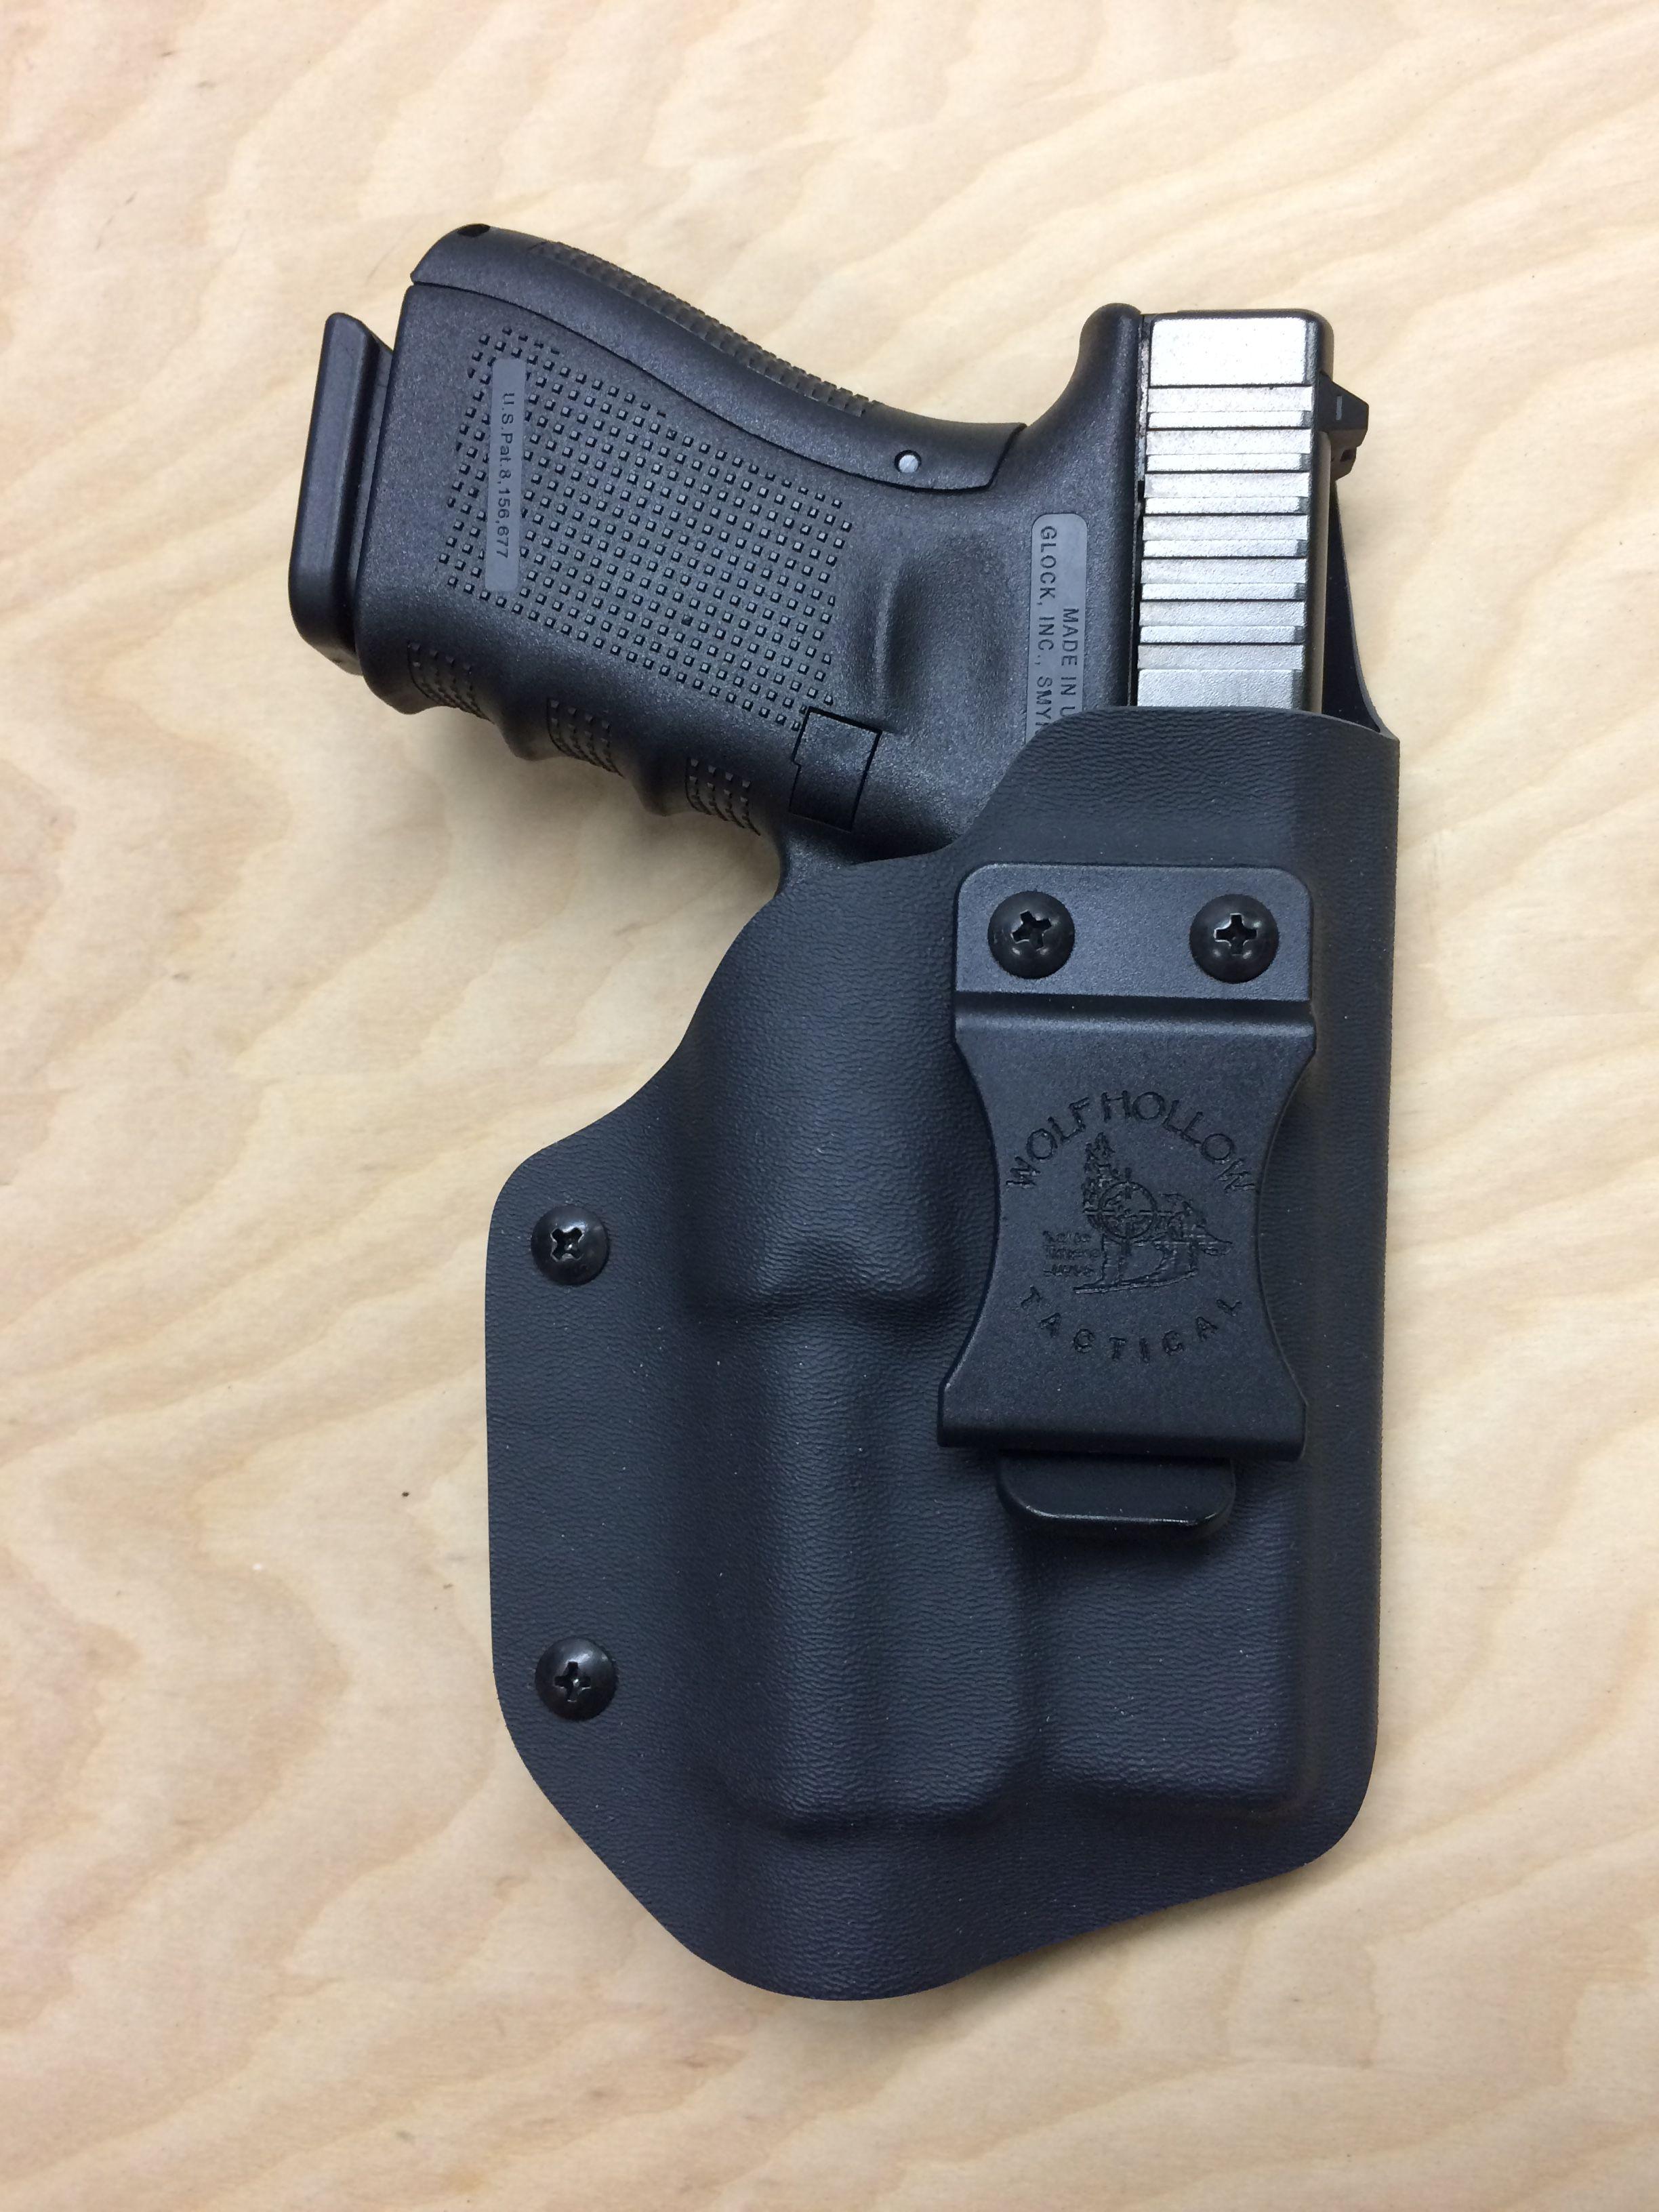 OD Green Kydex Light Holster for Glock 40 Streamlight TLR-2s